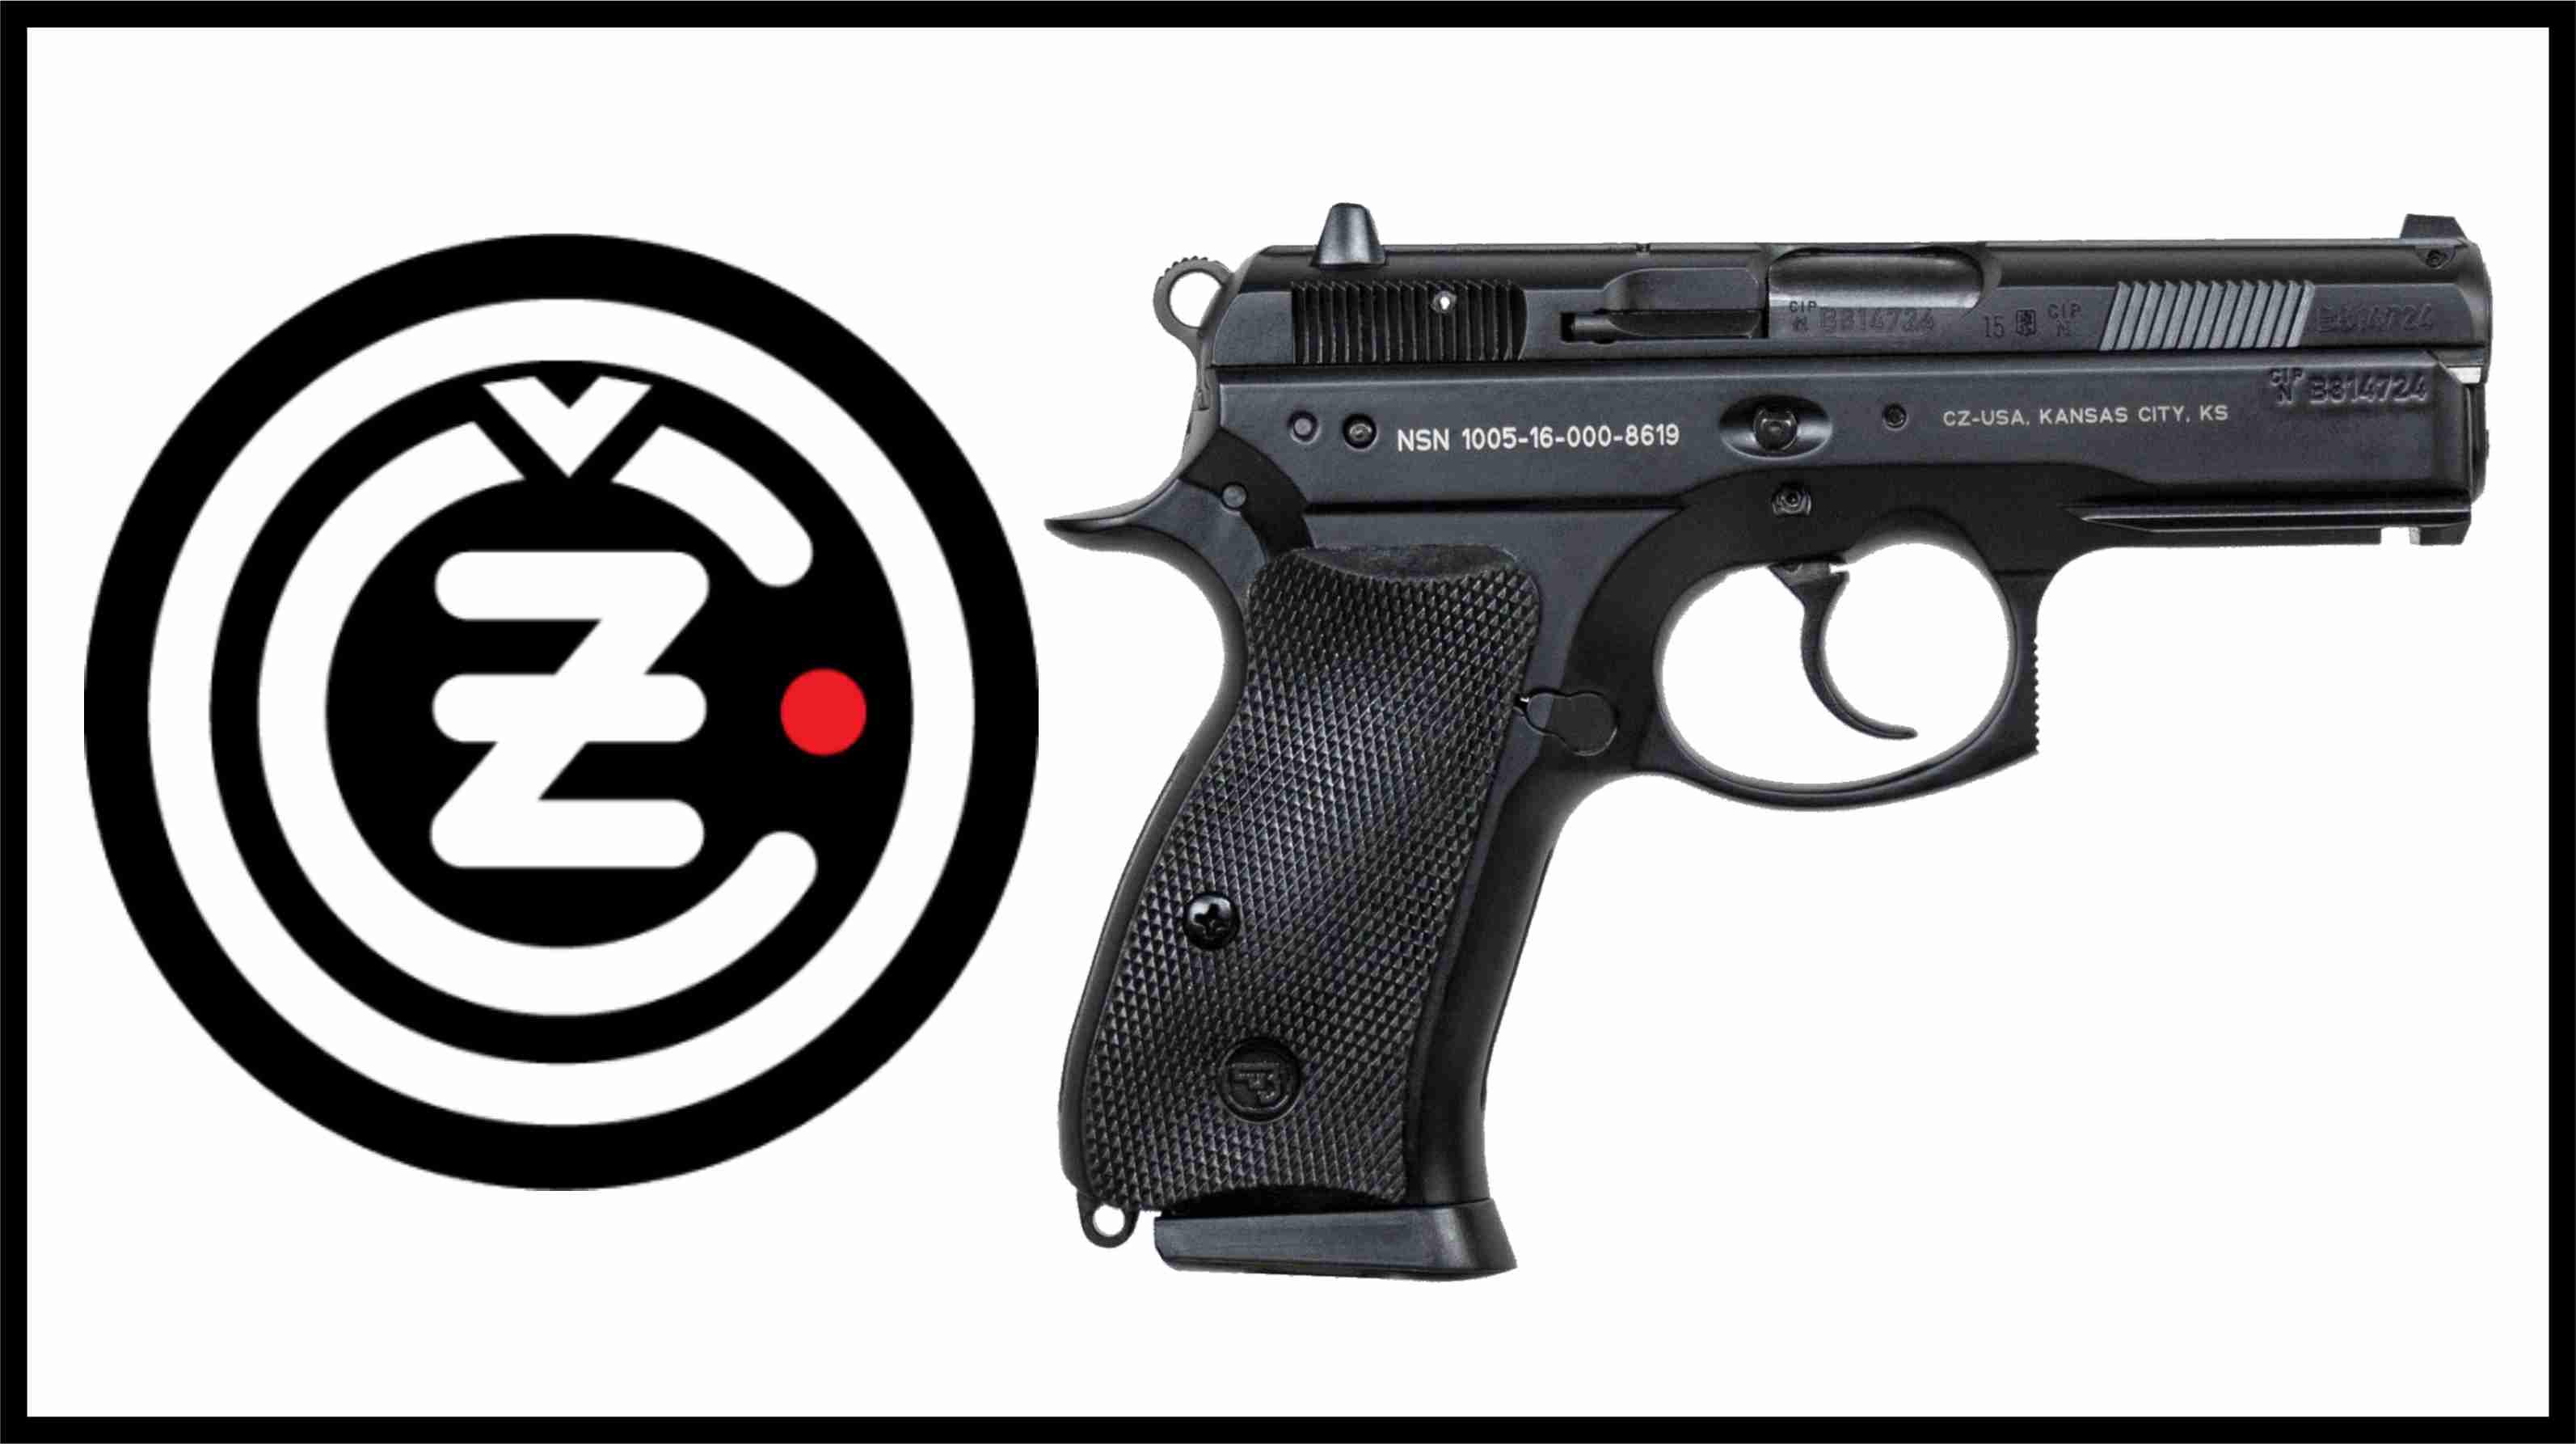 Gun World Burbank The Friendly Gun Shop 818-238-9071